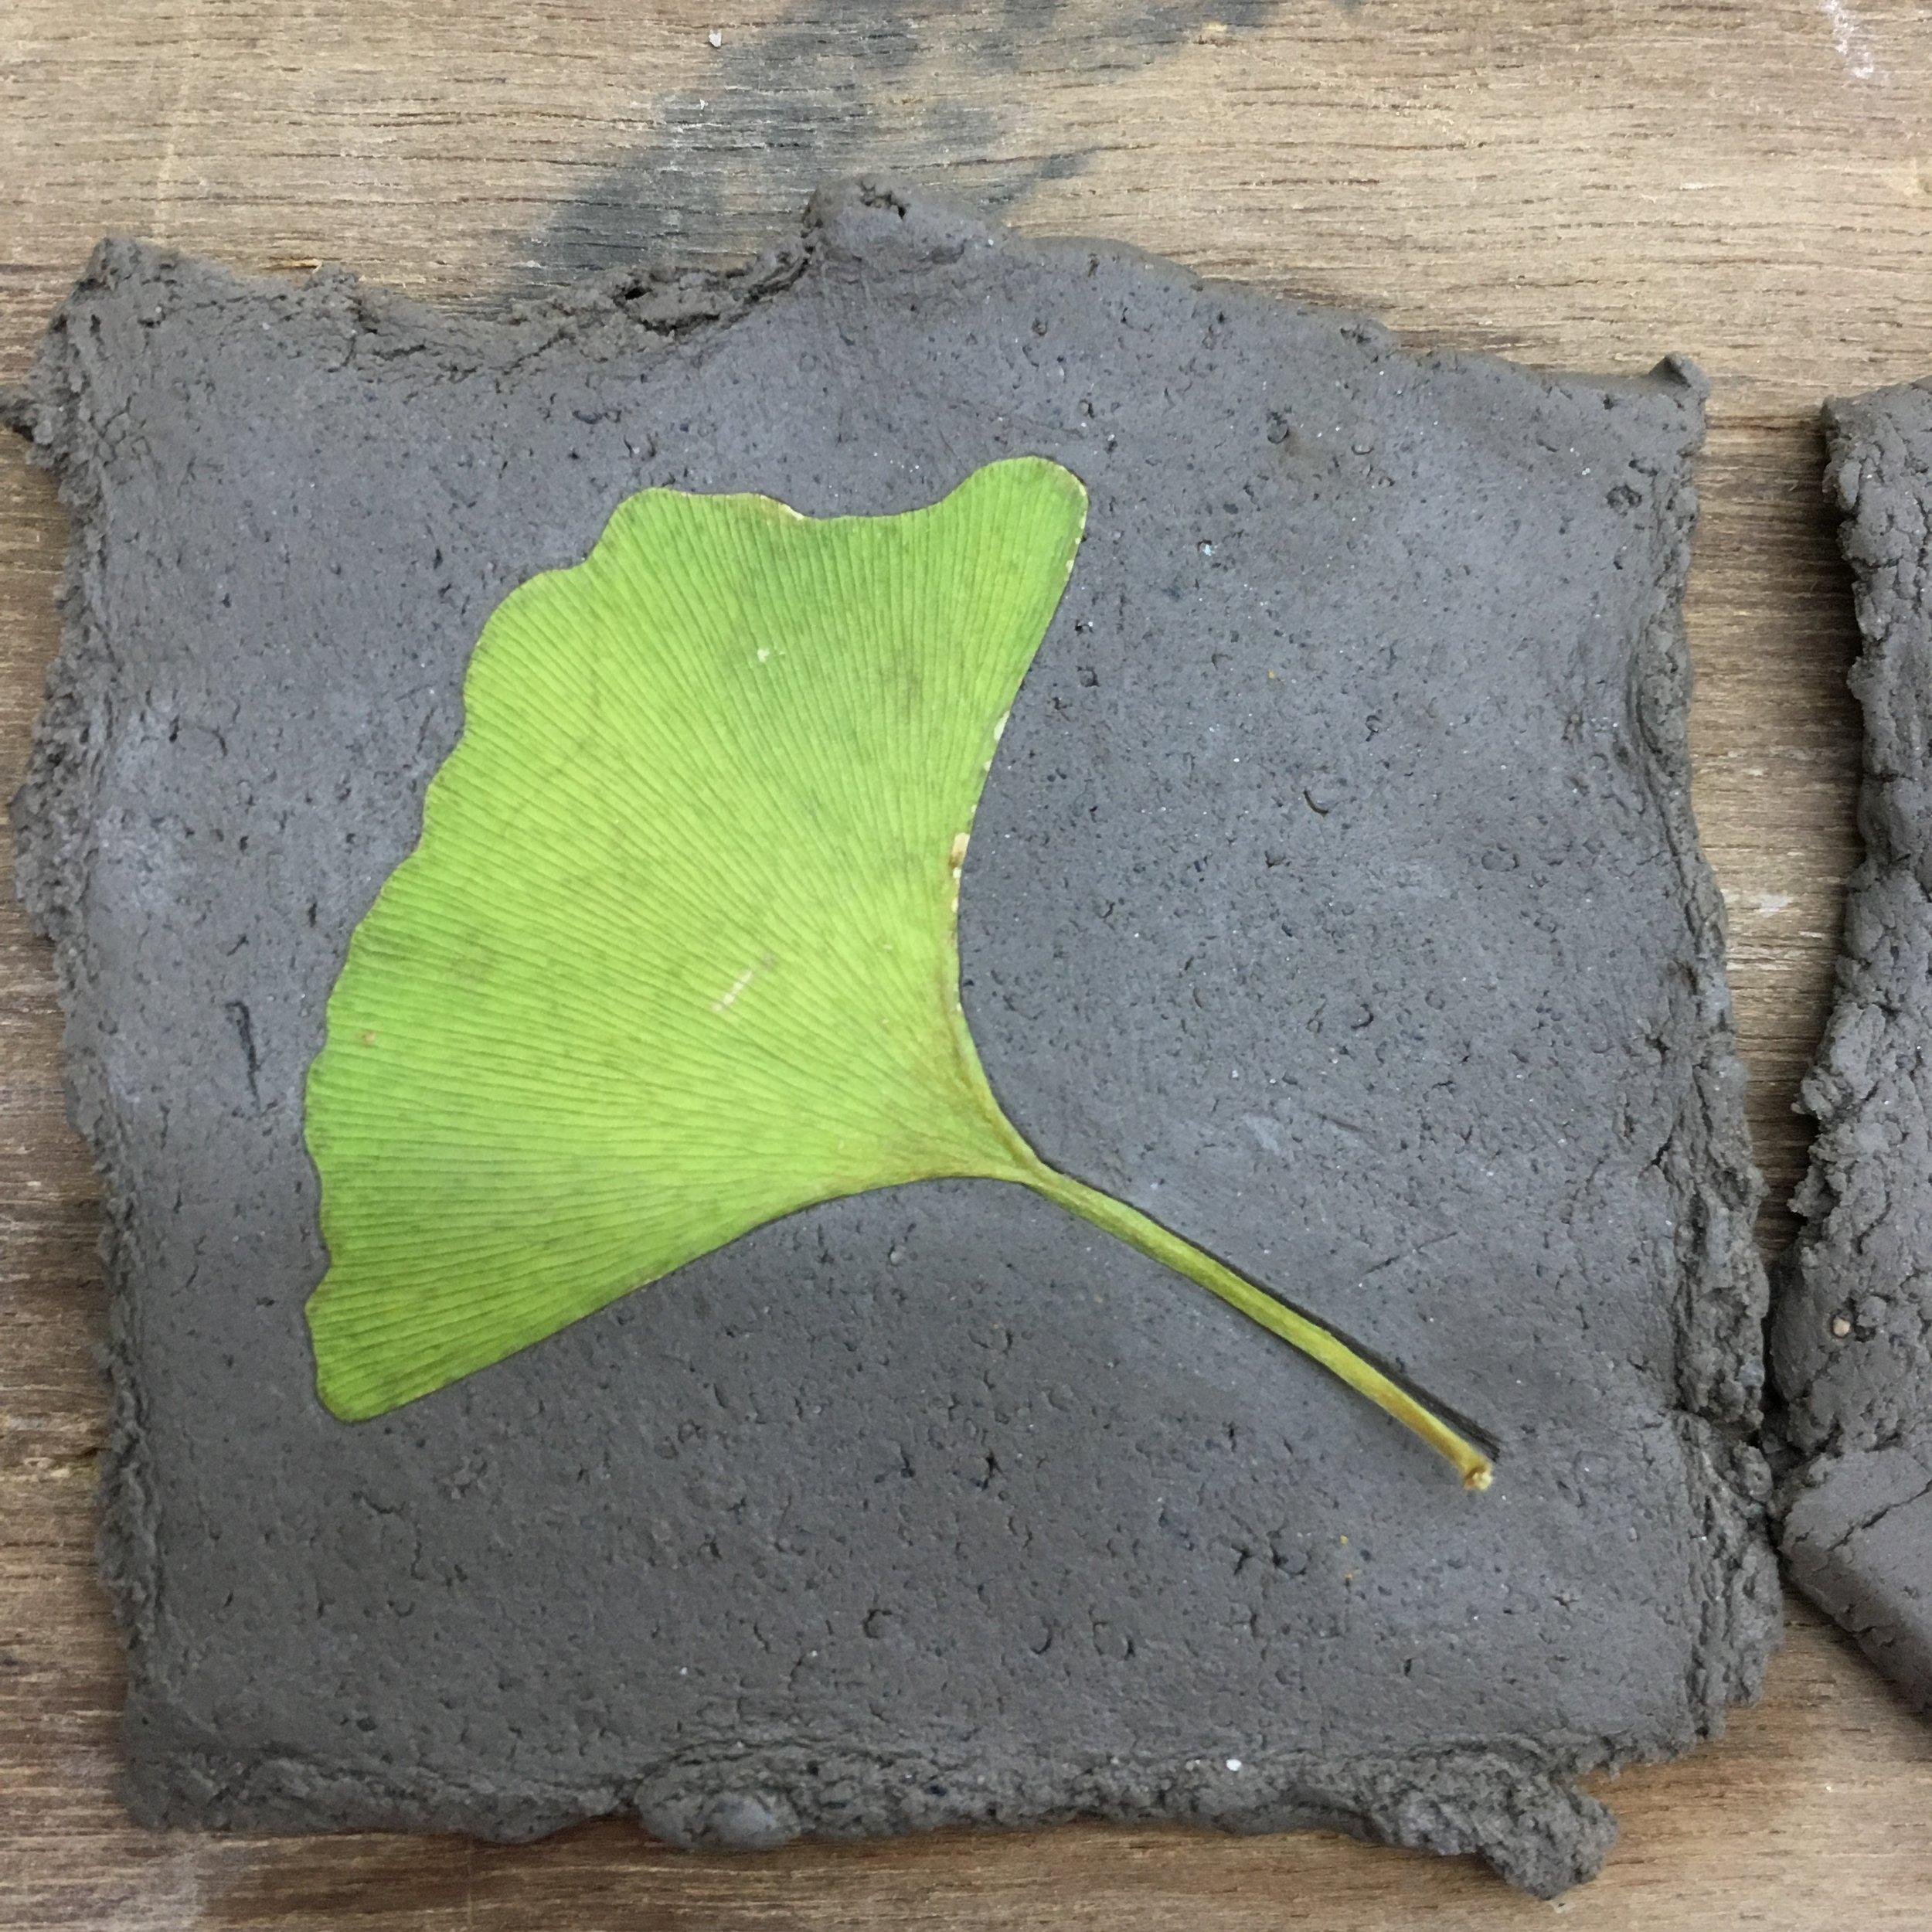 First Hibaku-Jumoku samples for test firing on Japanese clay.